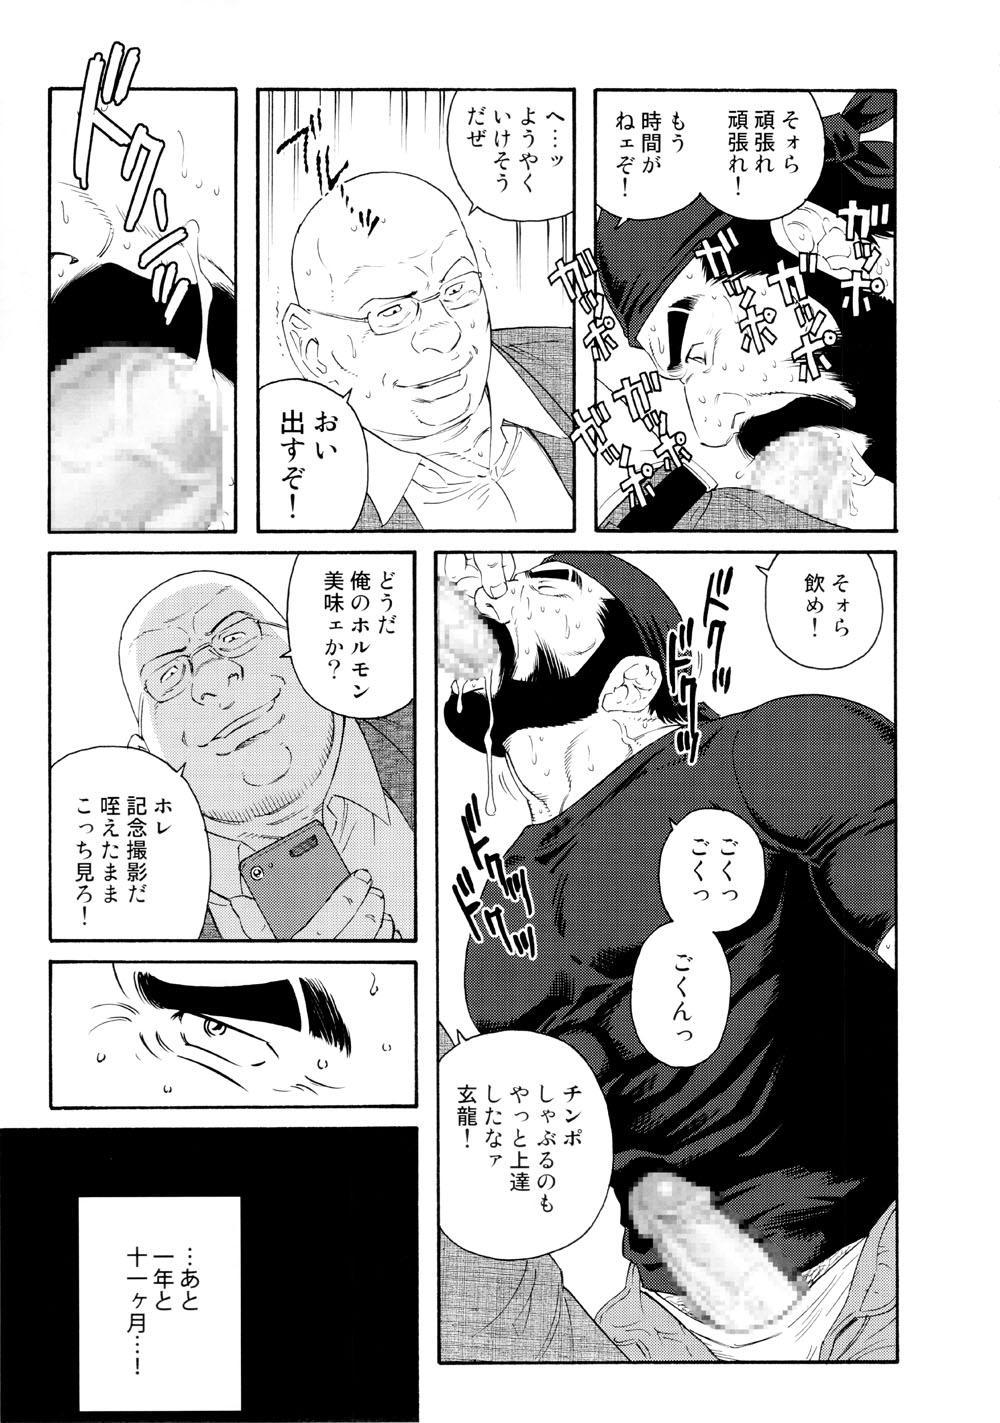 Genryu Chapter 3 2